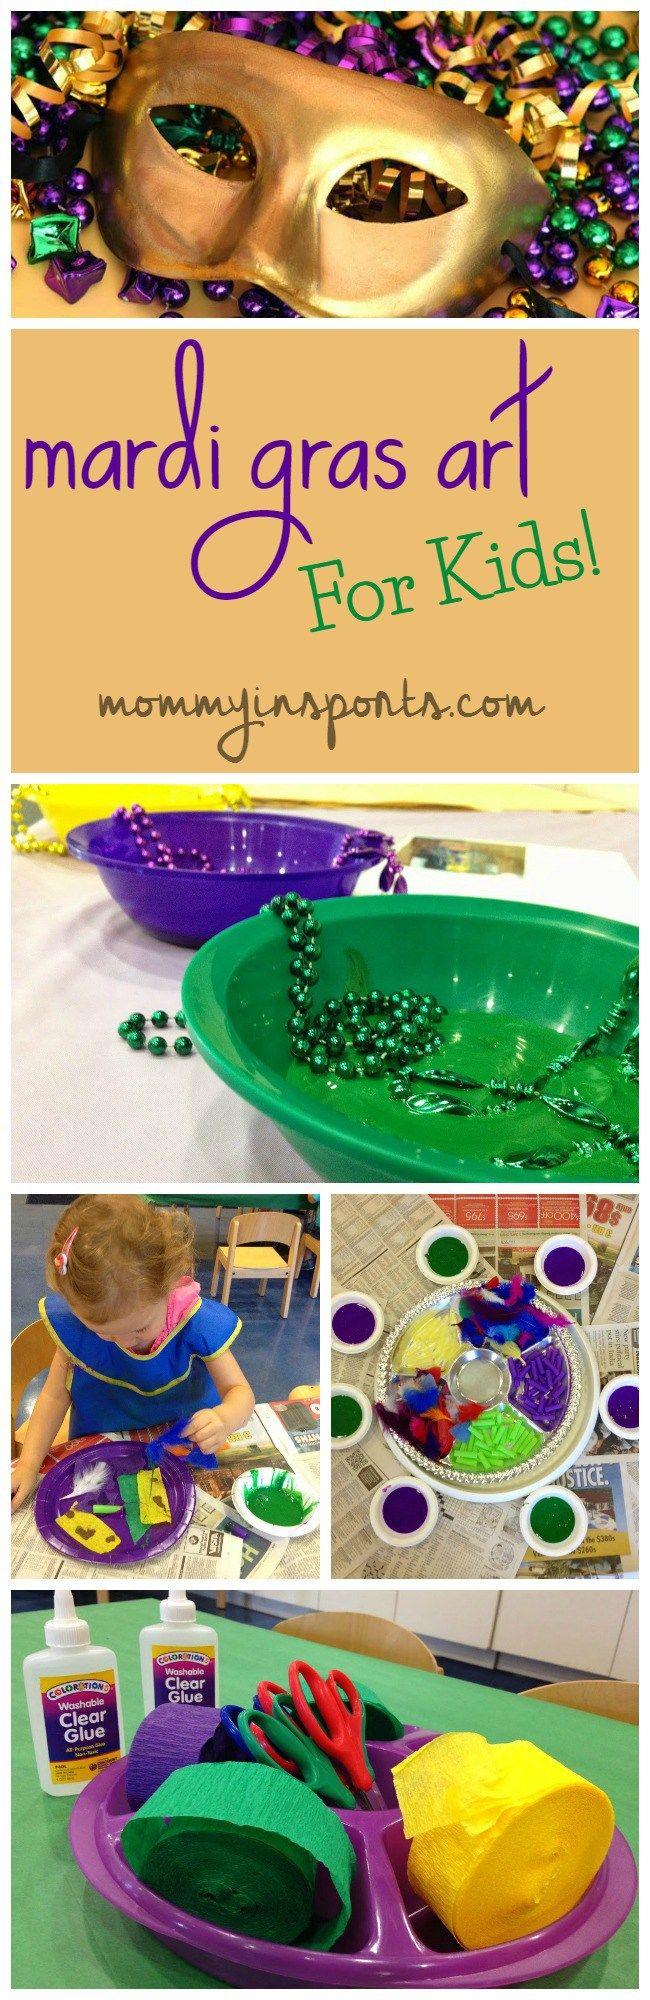 284 best Kid: Arts & Crafts images on Pinterest   Craft kids, Crafts ...